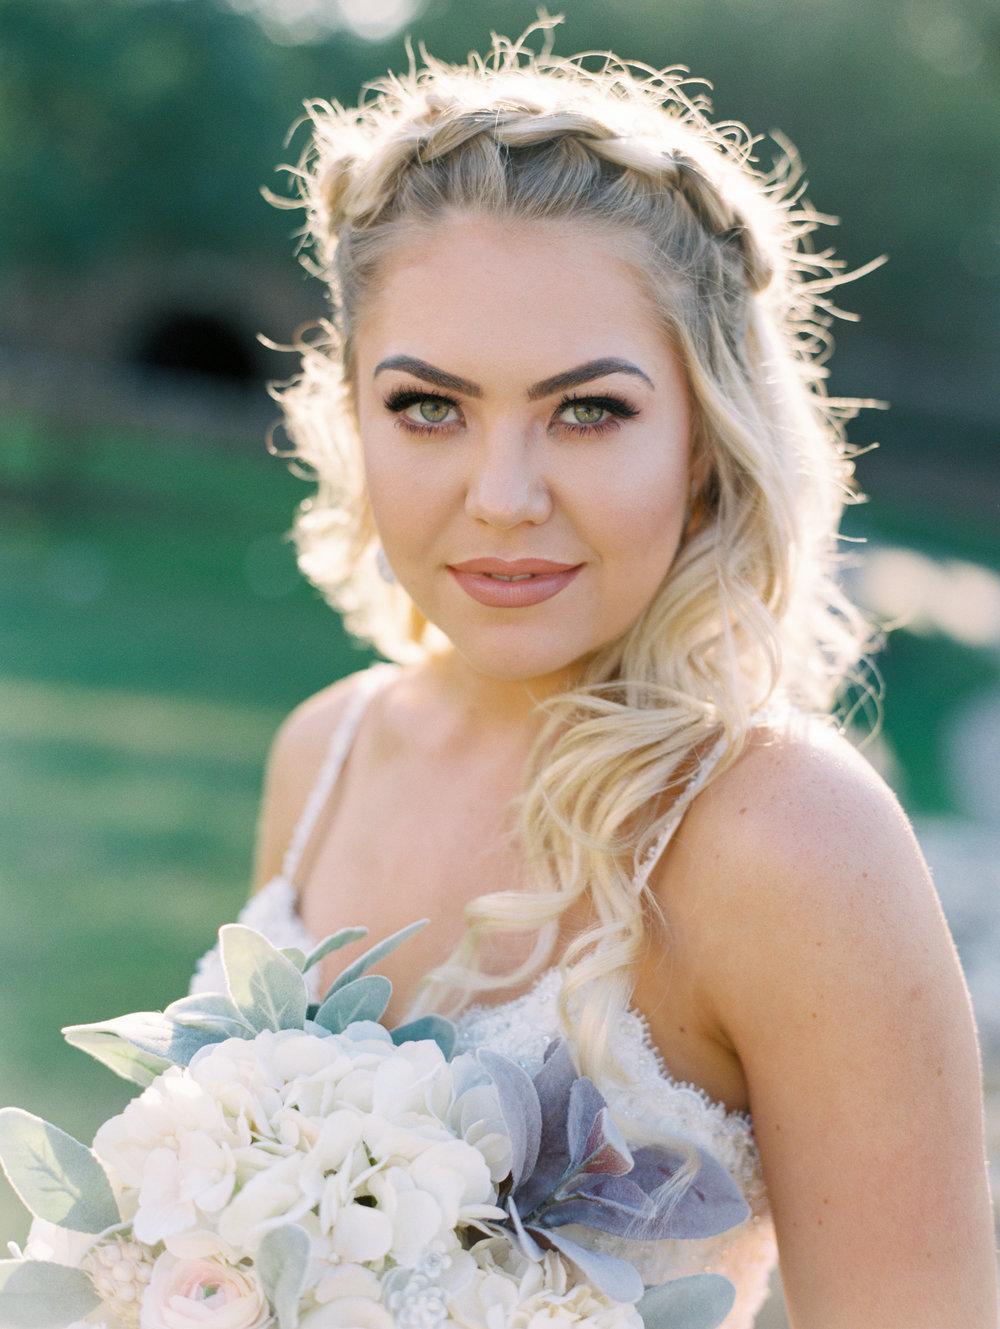 mckinney-texas-bella-donna-chapel-bridals-ar-photography-brianna-17.jpg